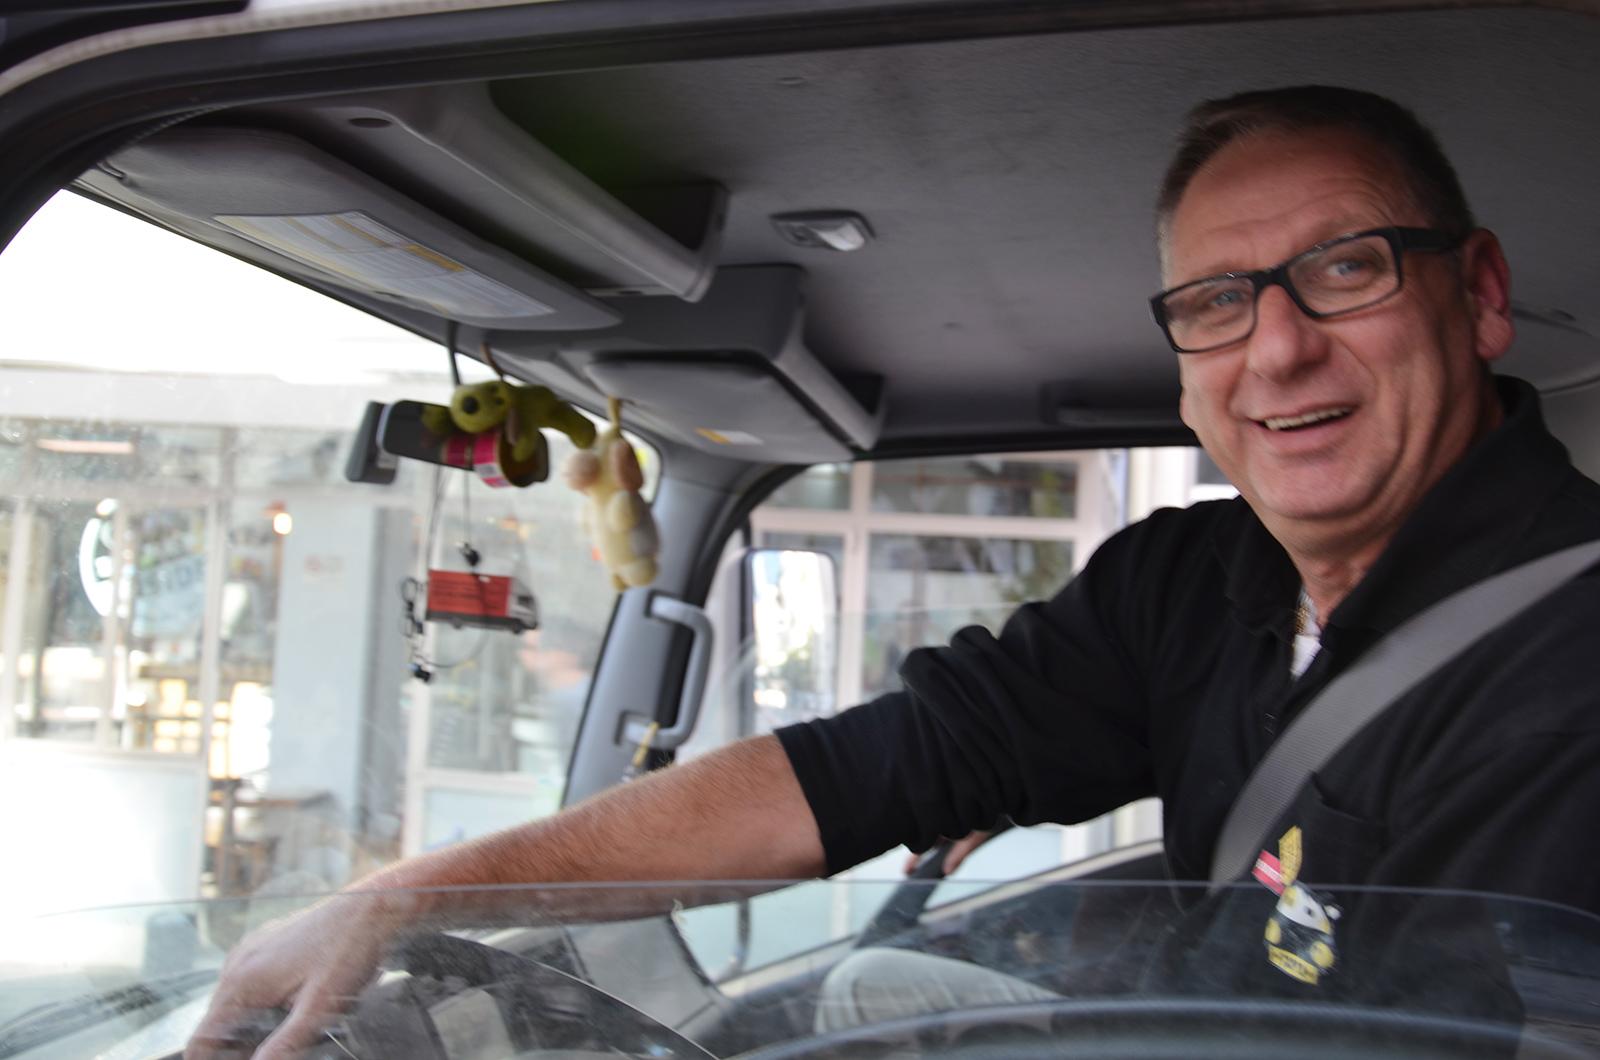 sympatický to Tel-Avivský řidič, Izrael